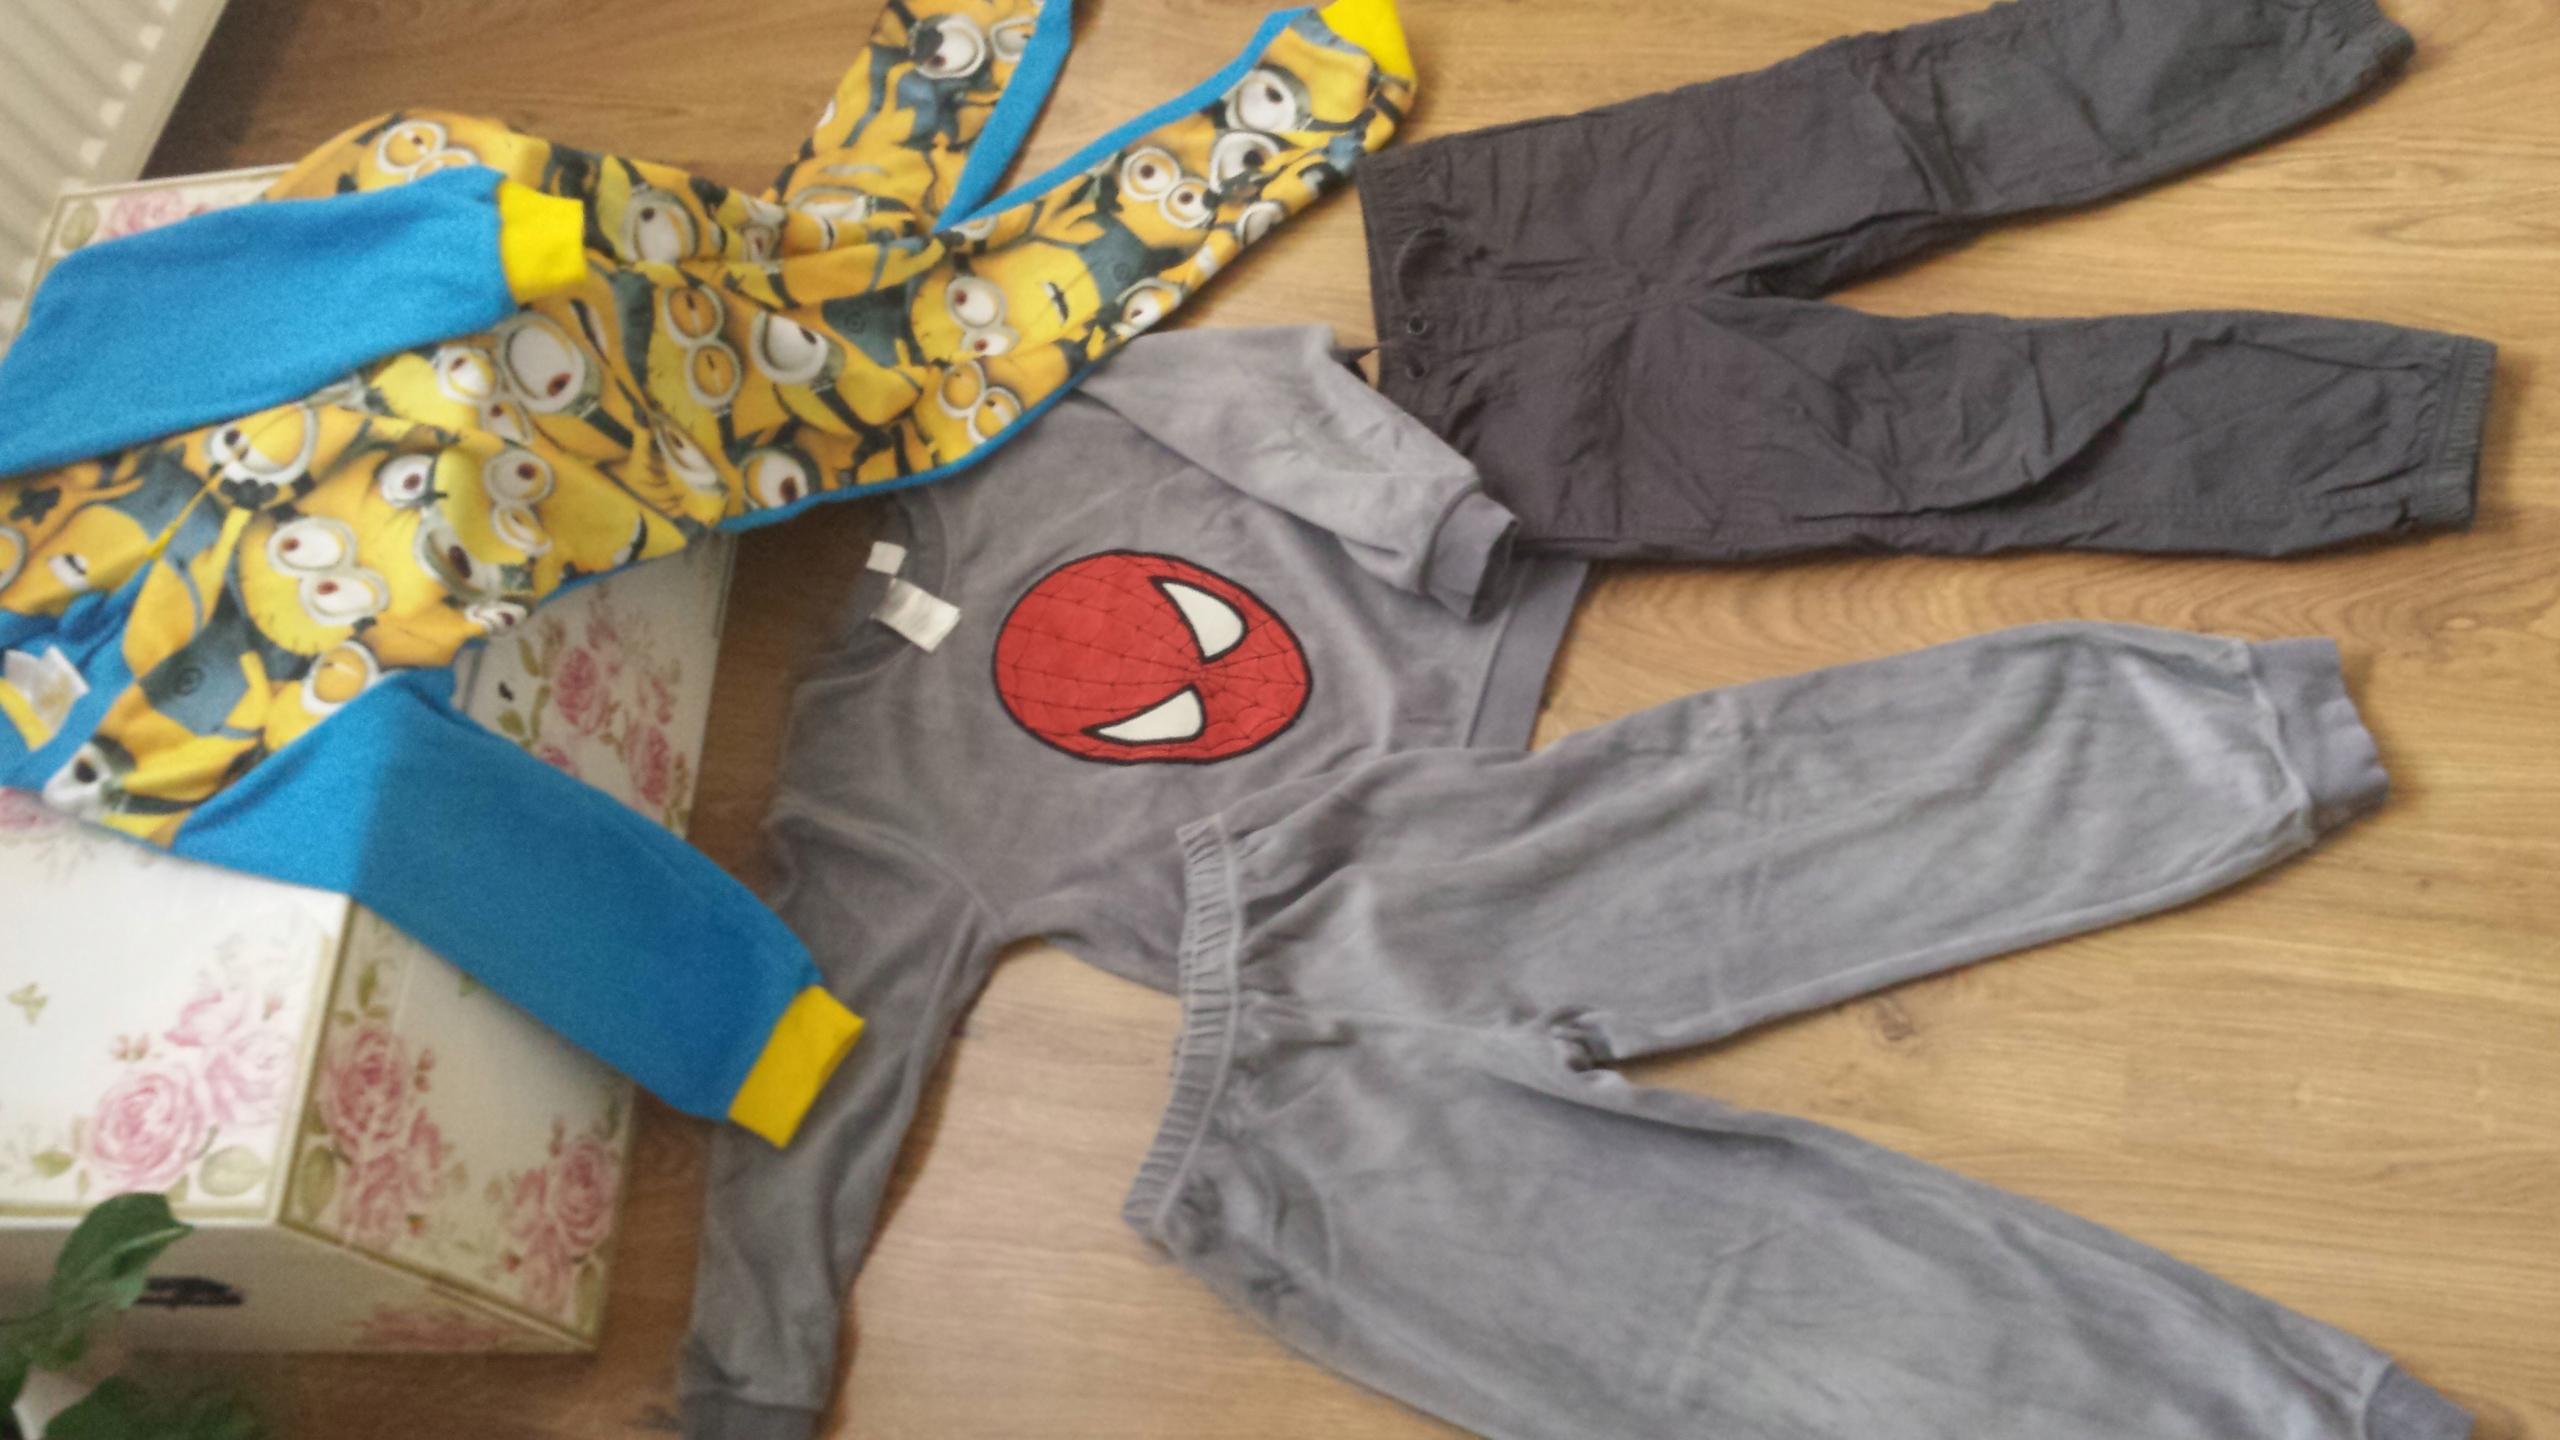 Komplet ubrań dla chłopca 110-116cm :)